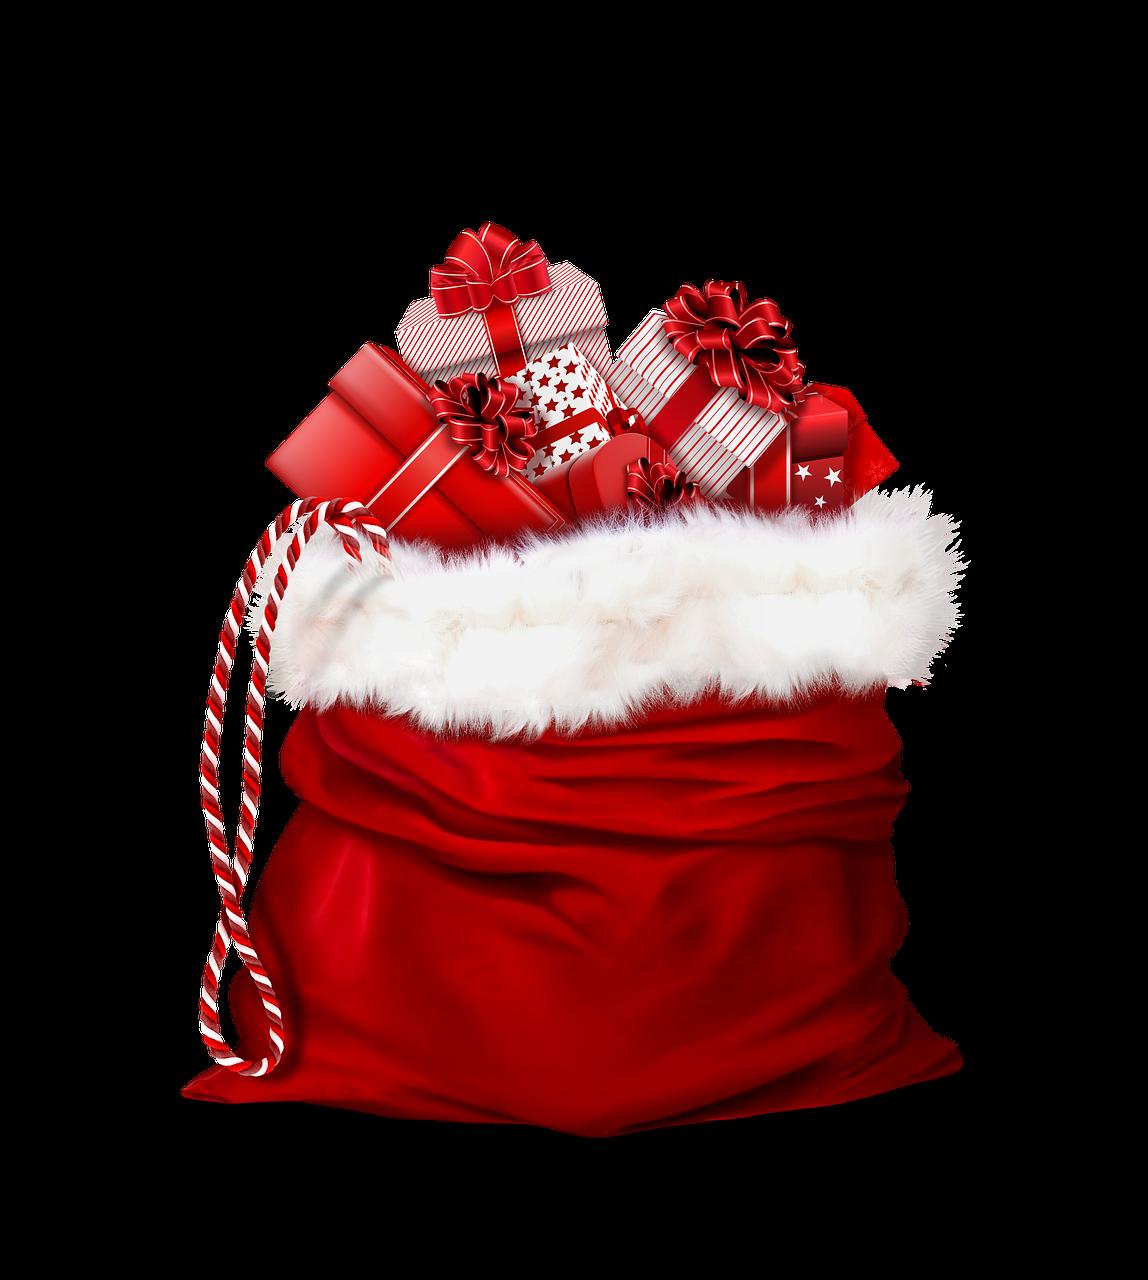 Santa Claus, Gaver, Rød, Pose, Julegave, Julen, Ferie